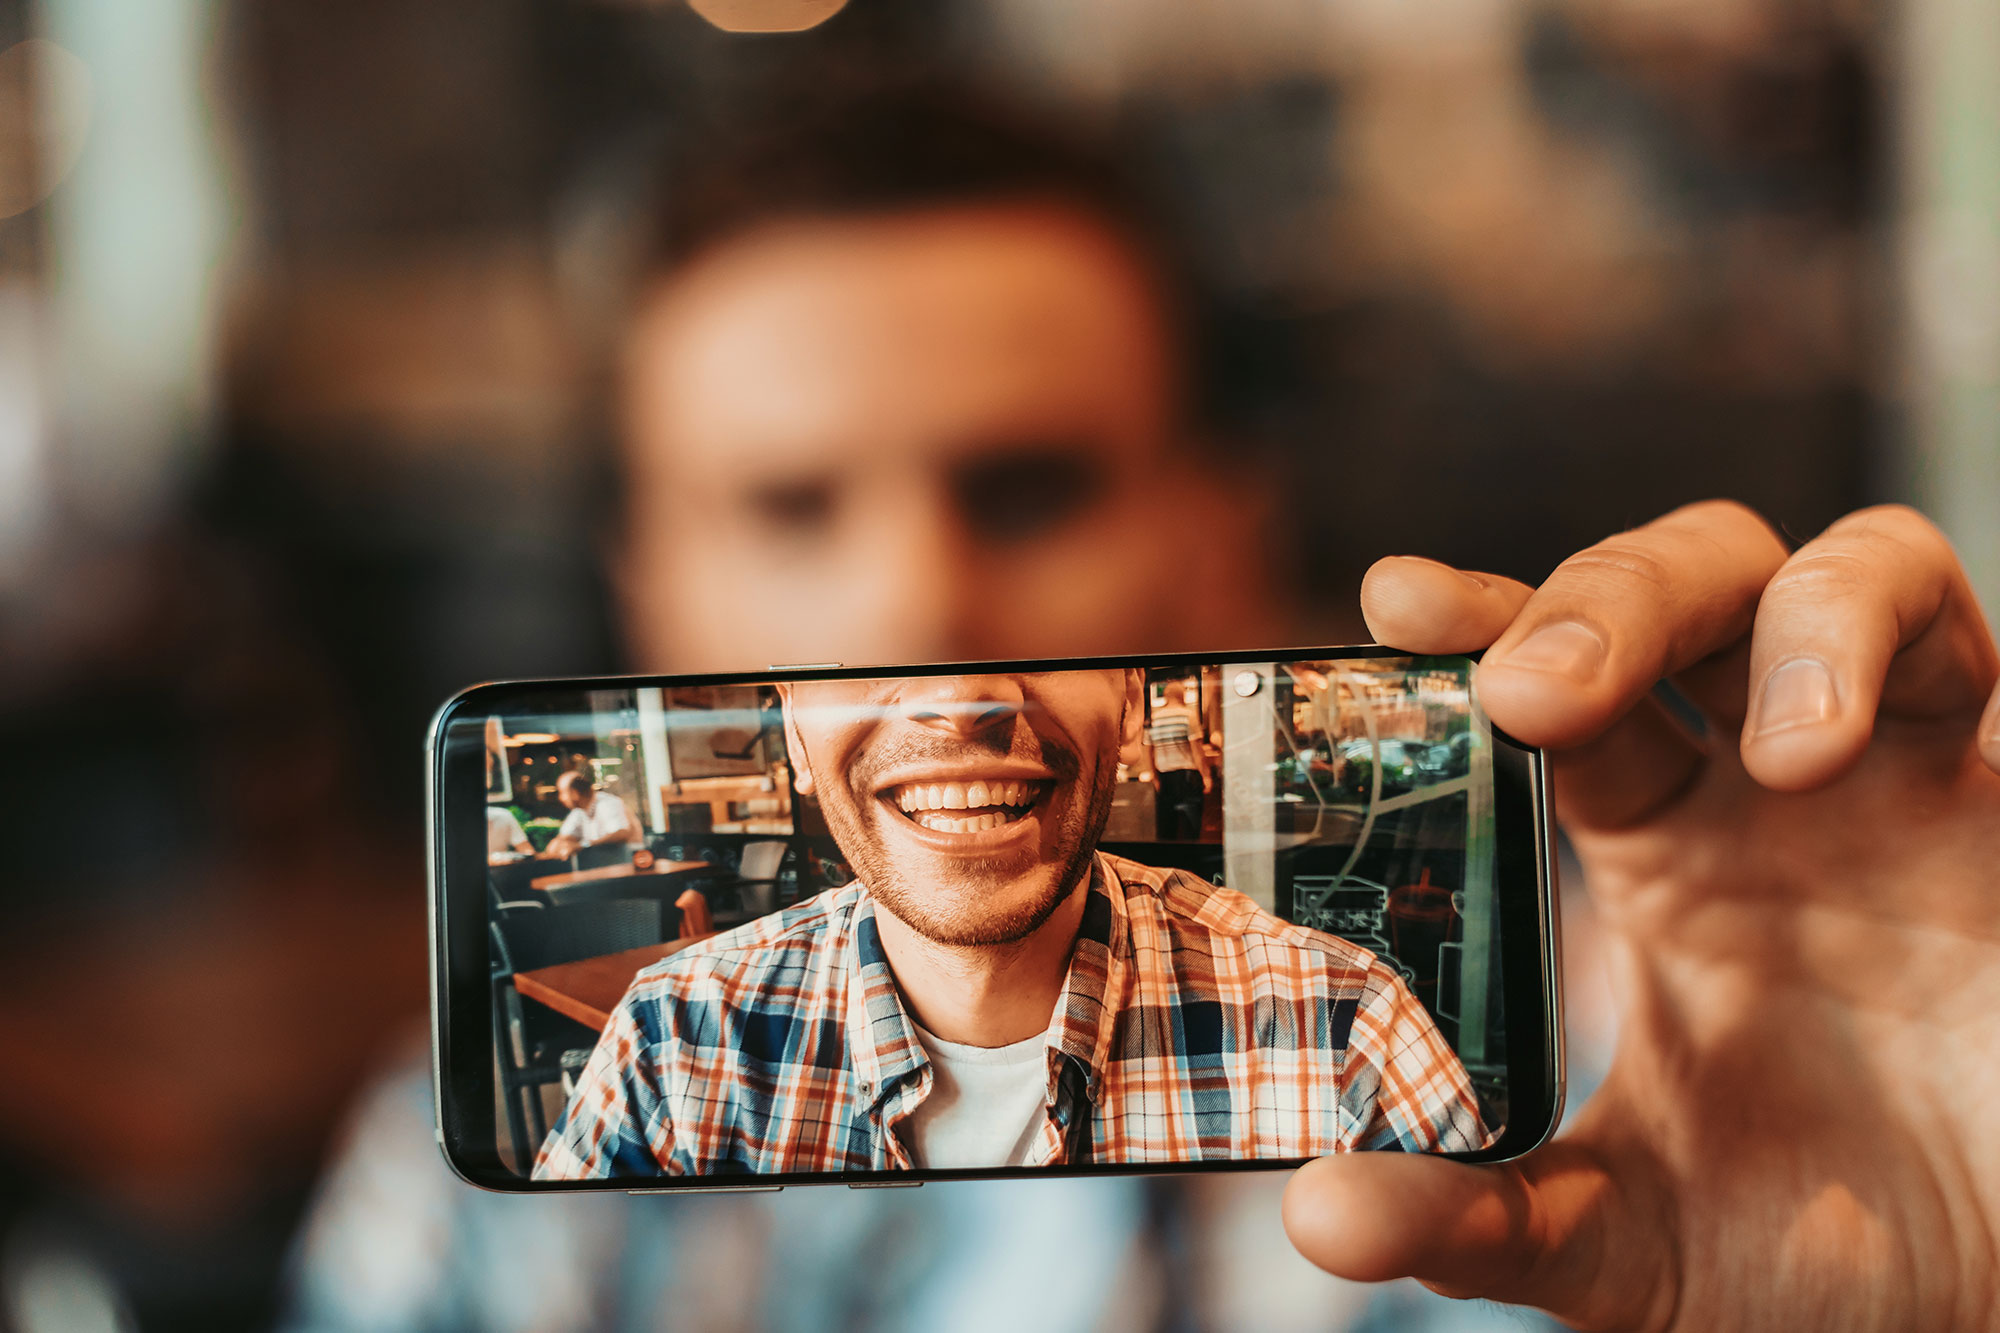 Smile-Selfie-Close-Up